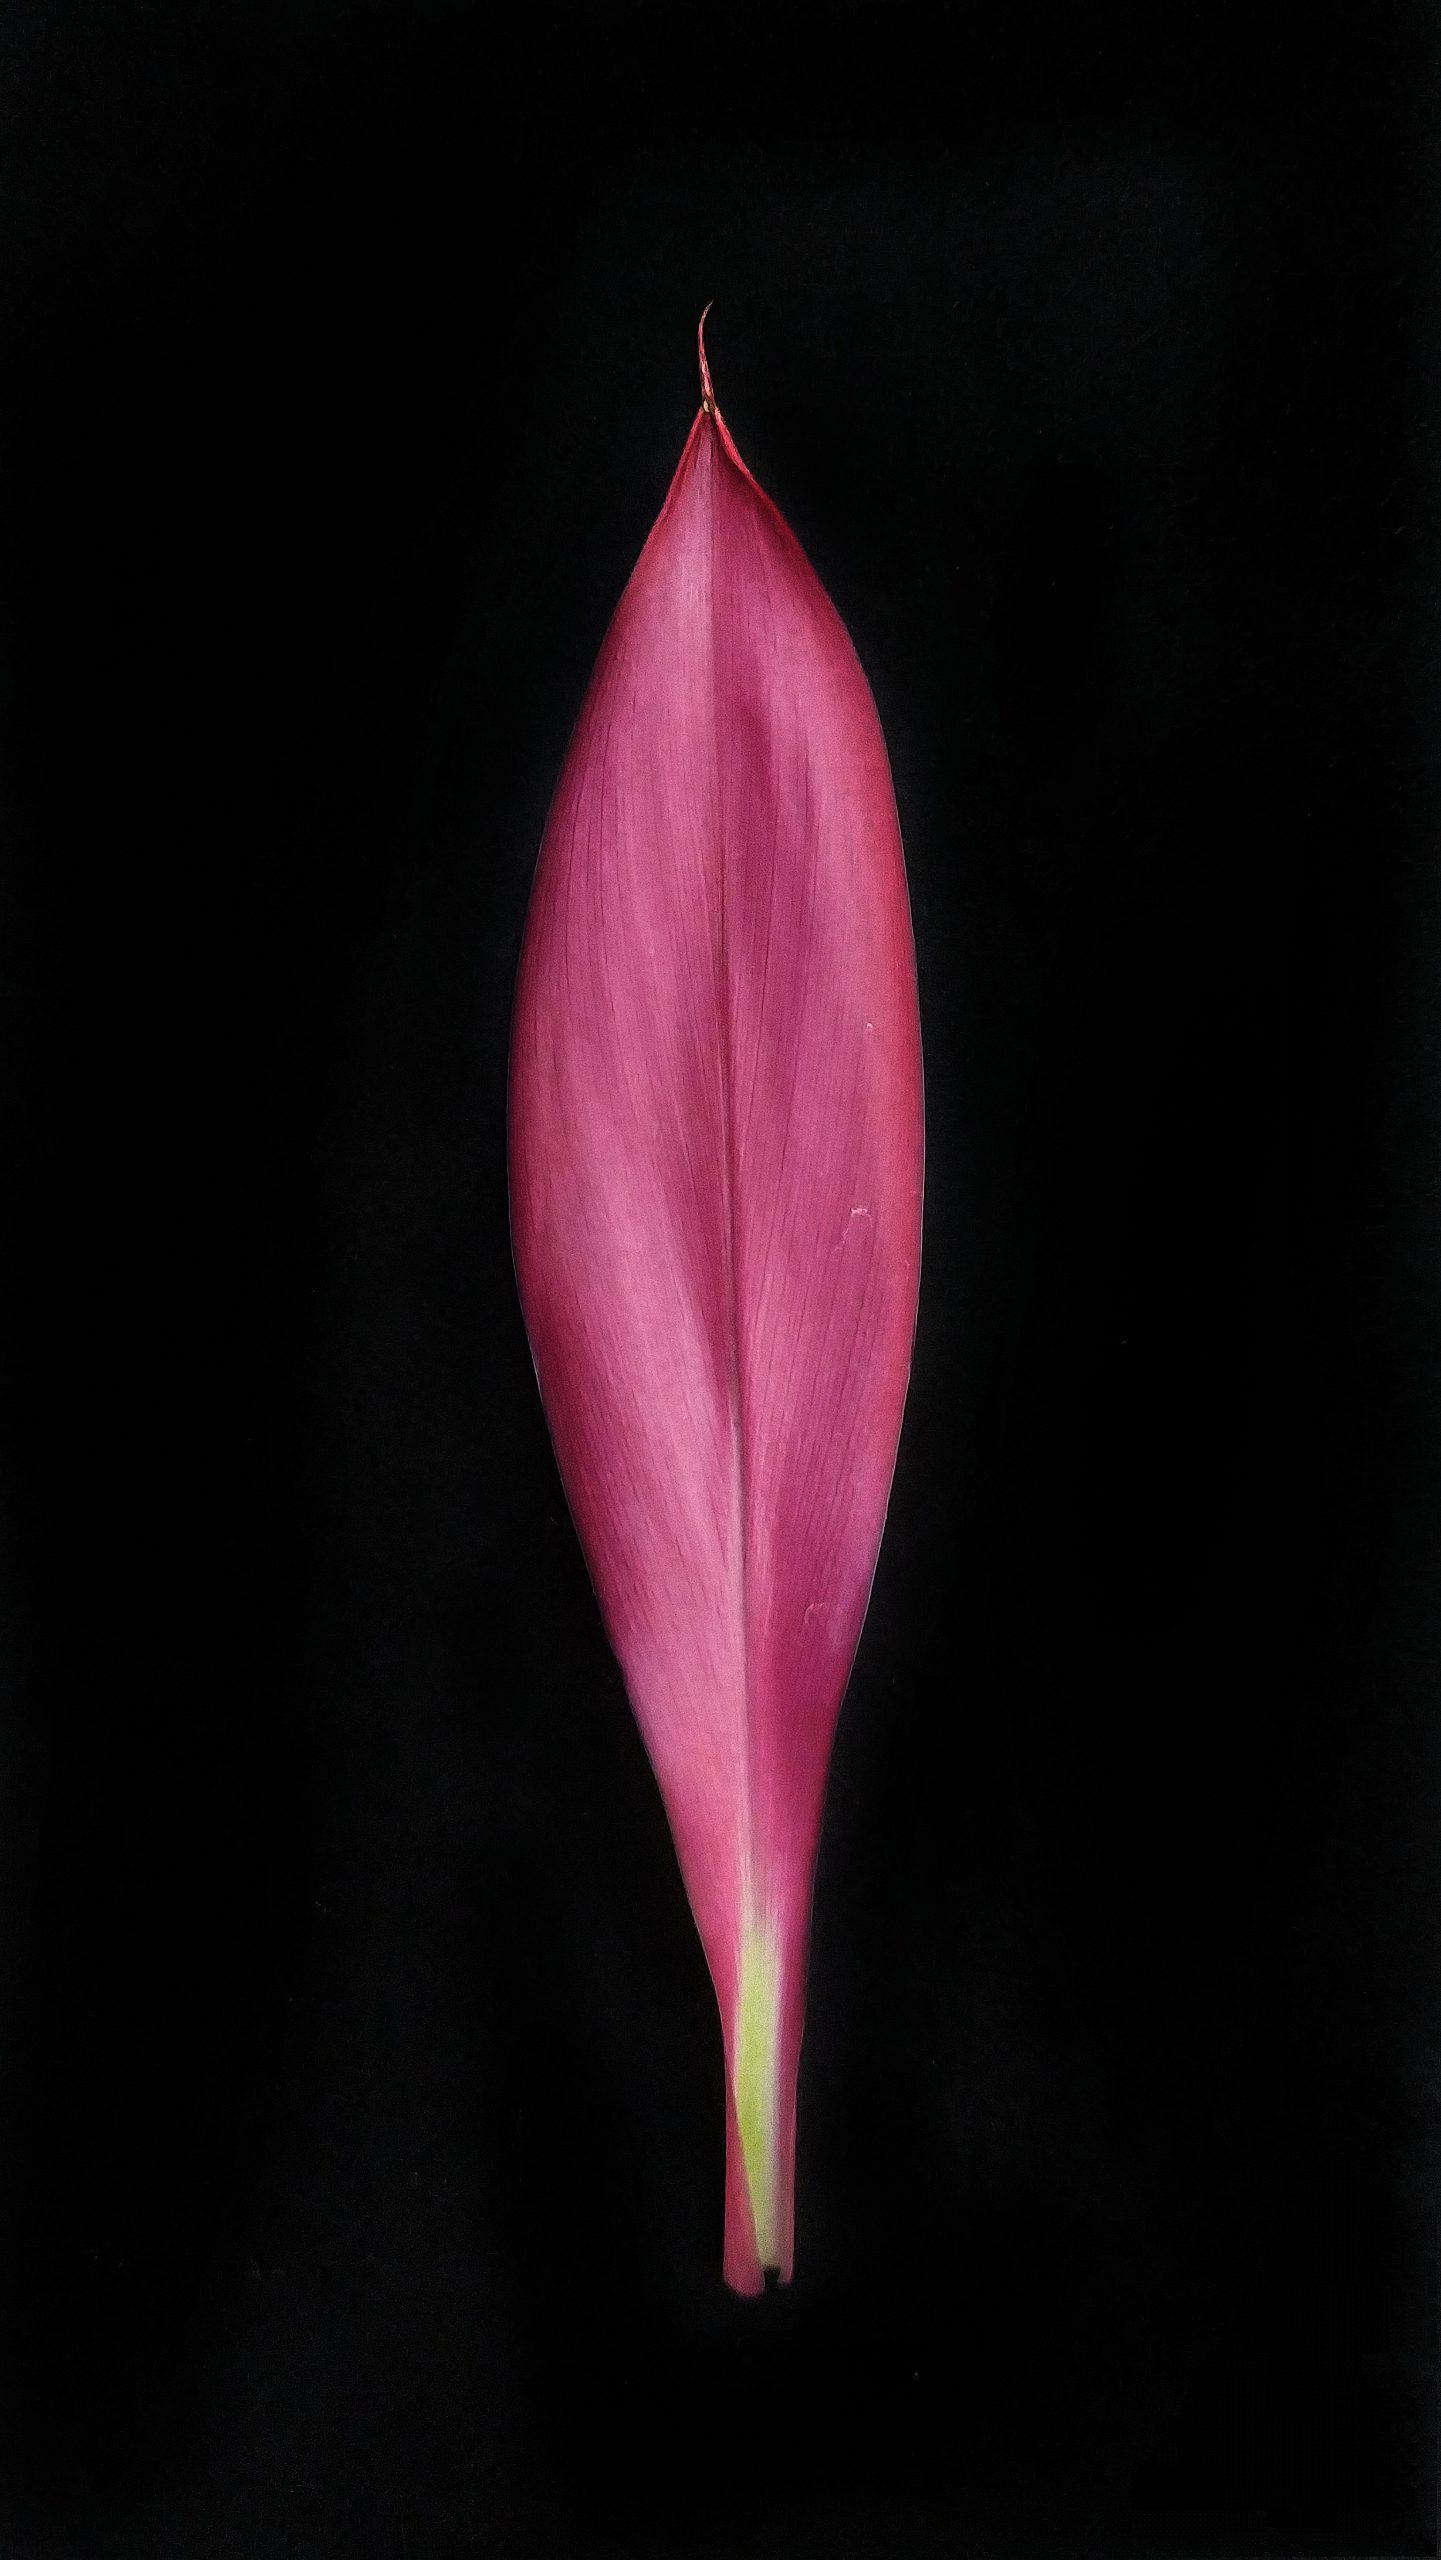 Plant Pink leaf